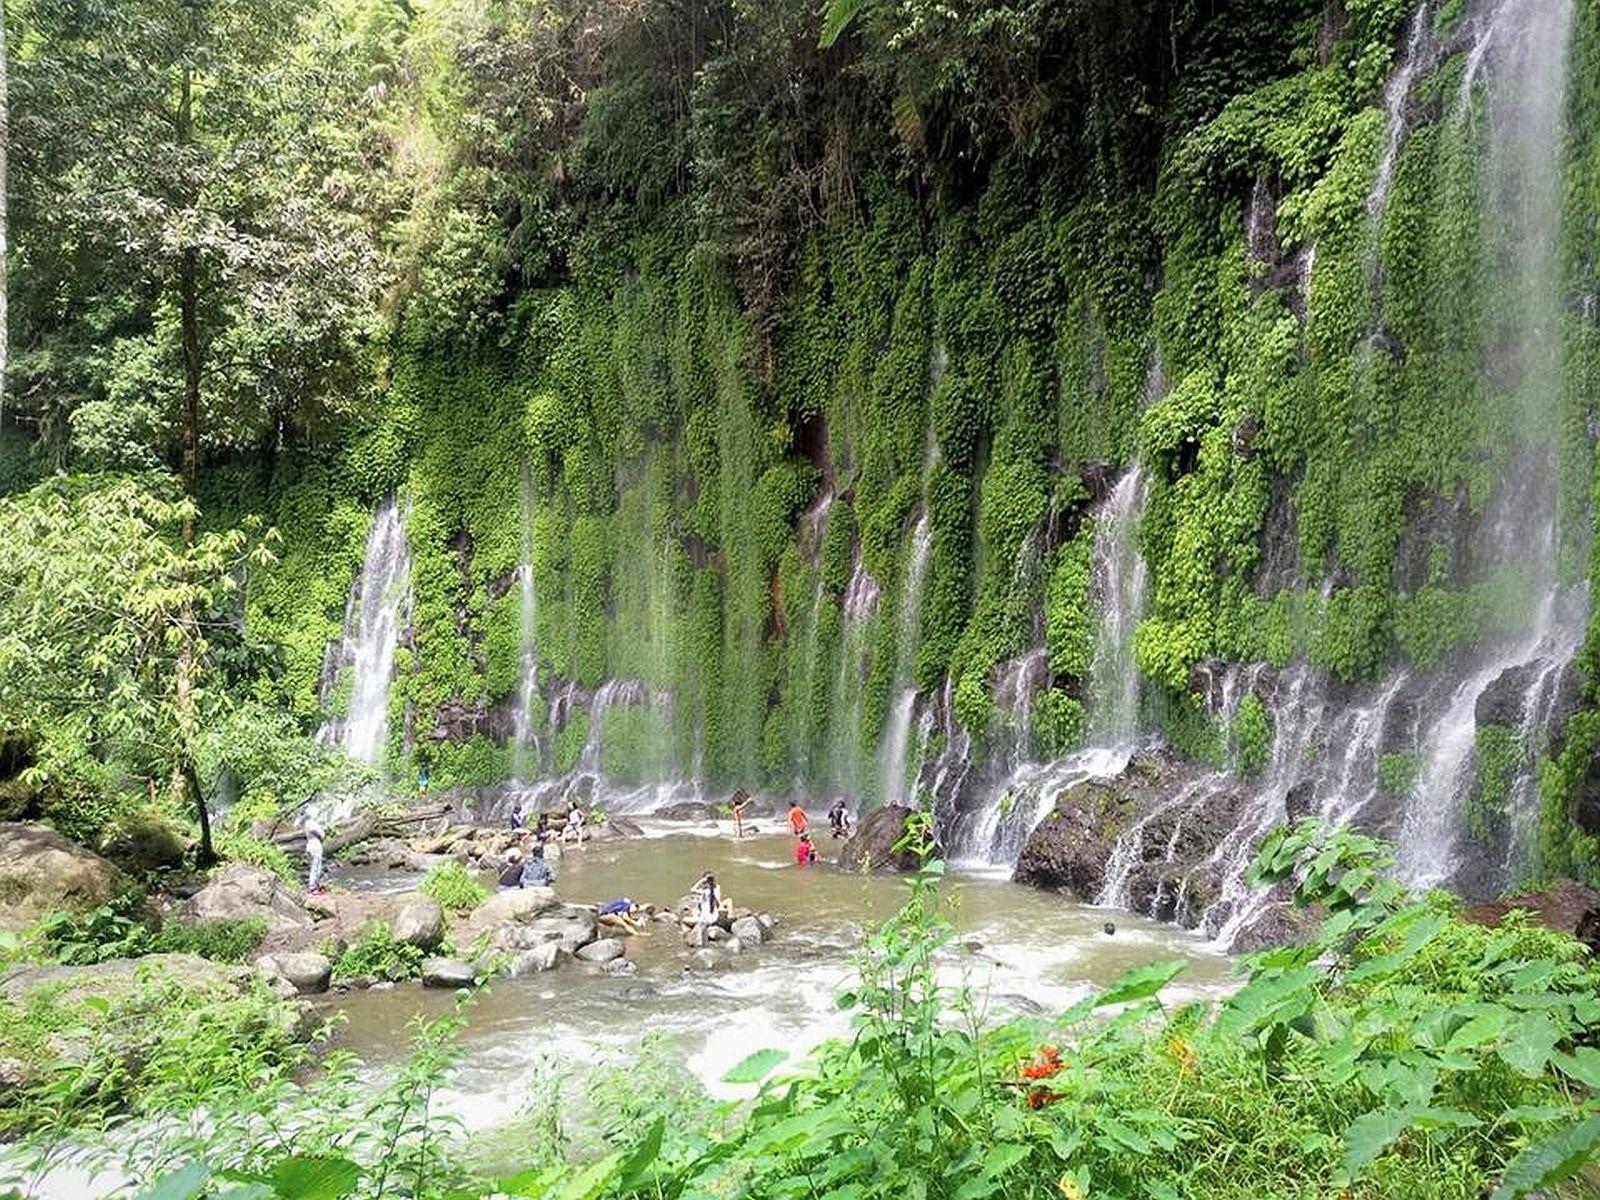 PHILIPPINEN REISEN - ORTE - MINDANAO - COTABATO - Alamada